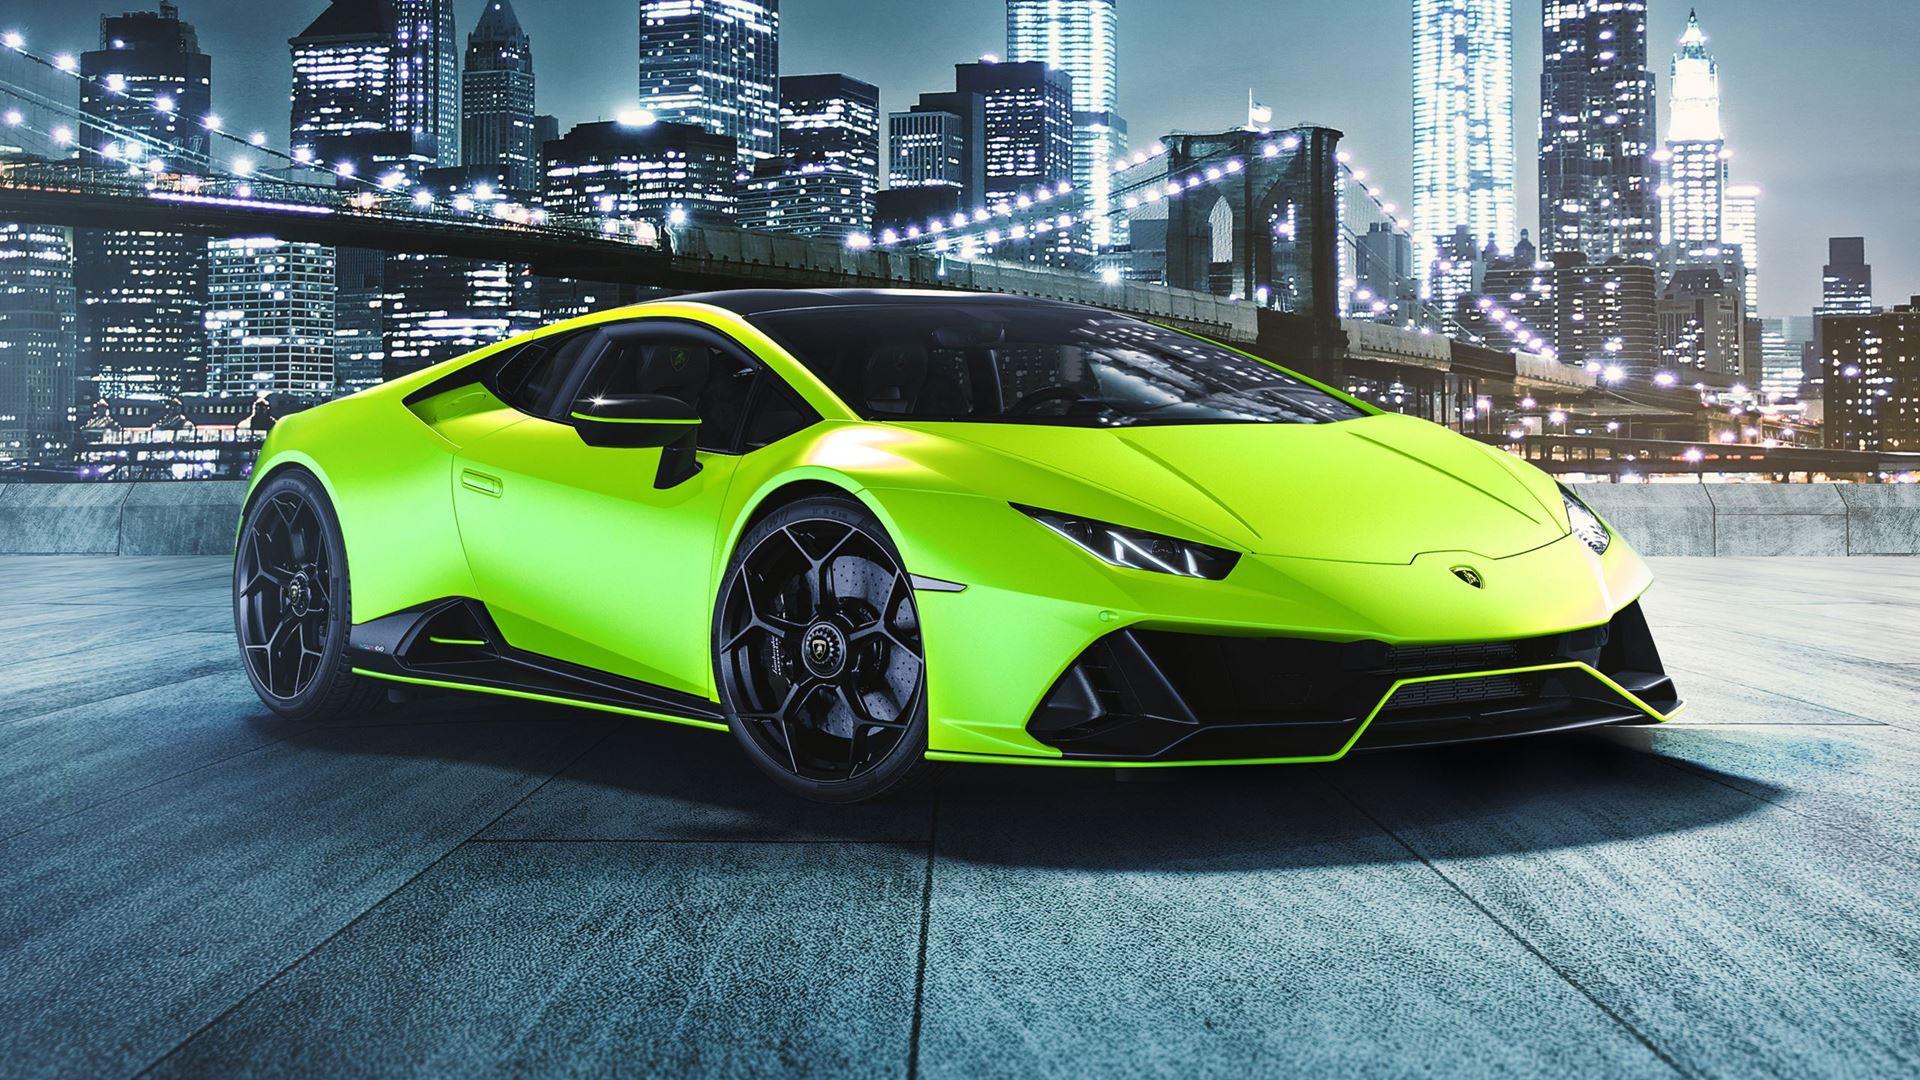 Daring elegance: Automobili Lamborghini presents the Huracán EVO Fluo Capsule - Image 8